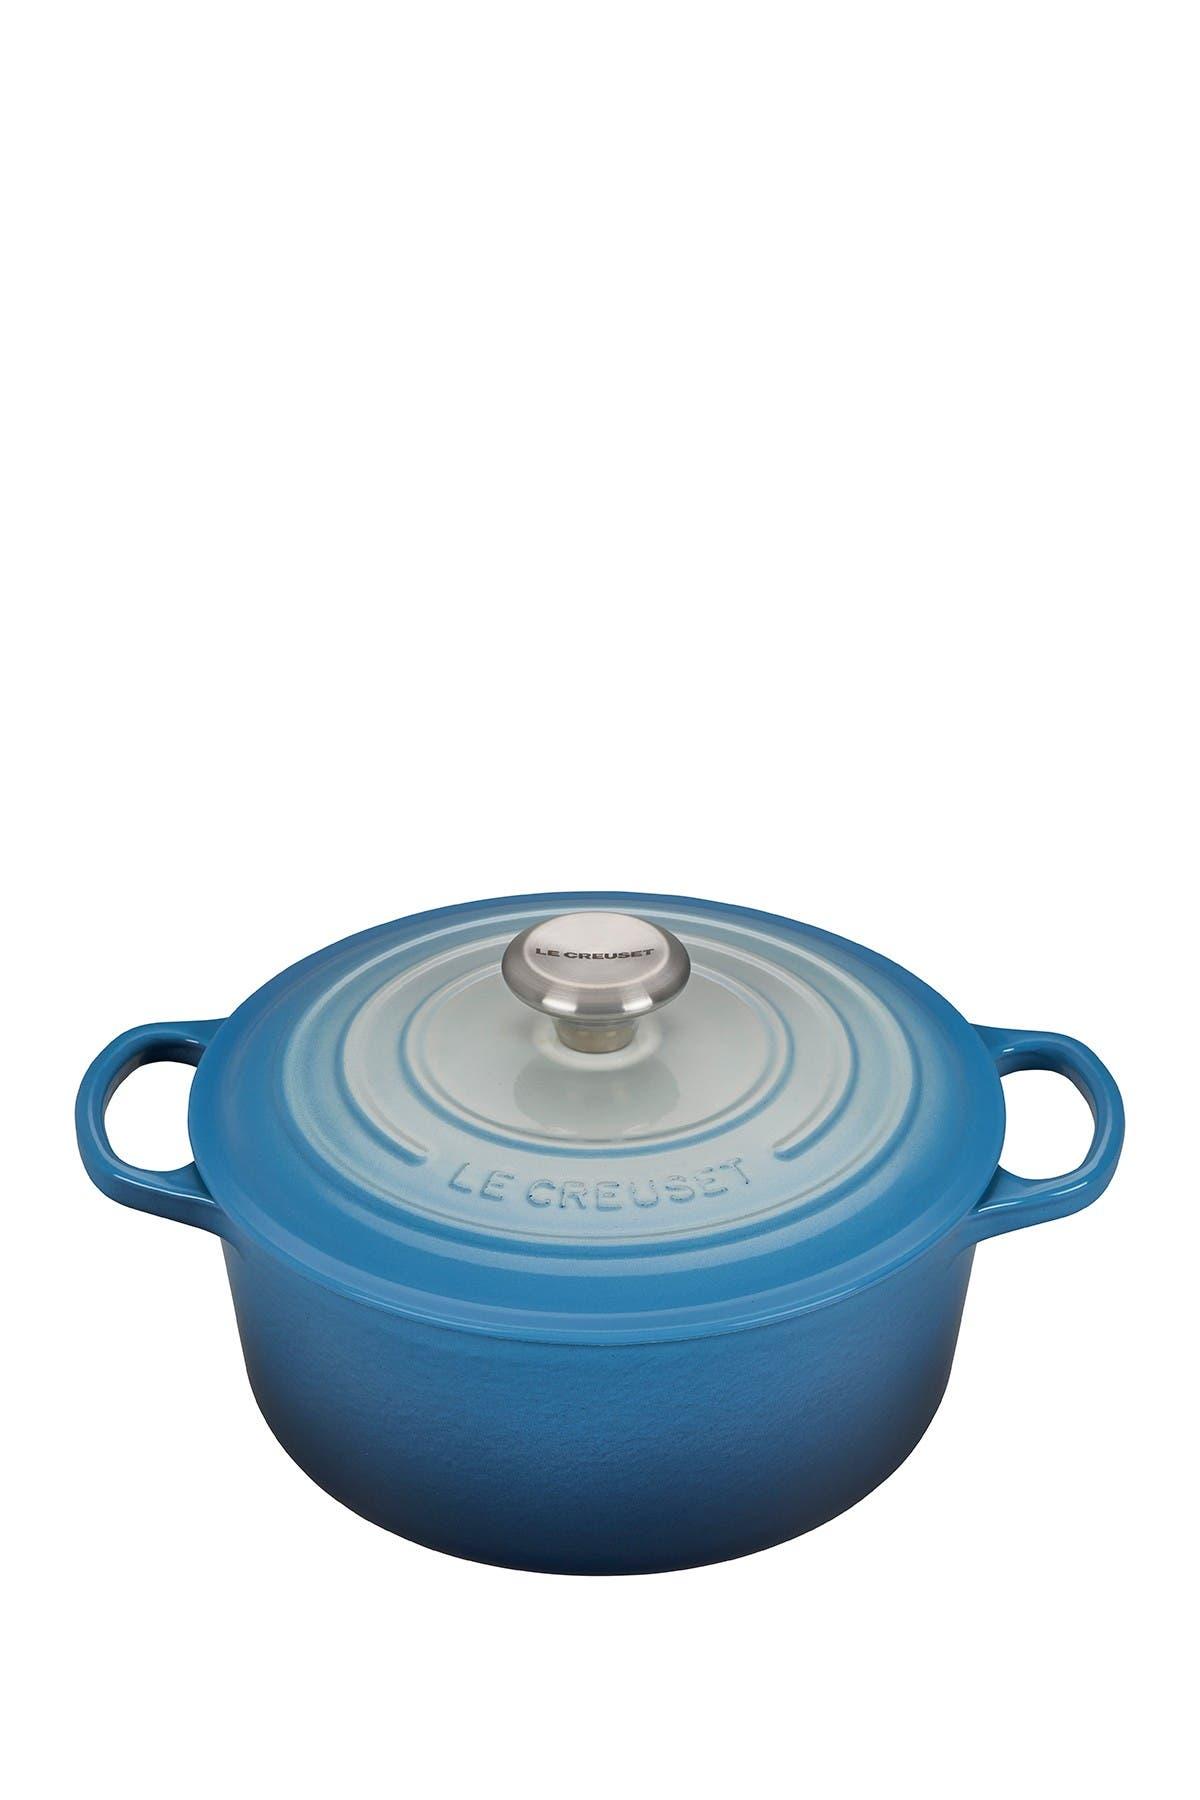 Image of Le Creuset Limited Time Blue Ombre 4.5 qt. Signature Round Dutch Oven